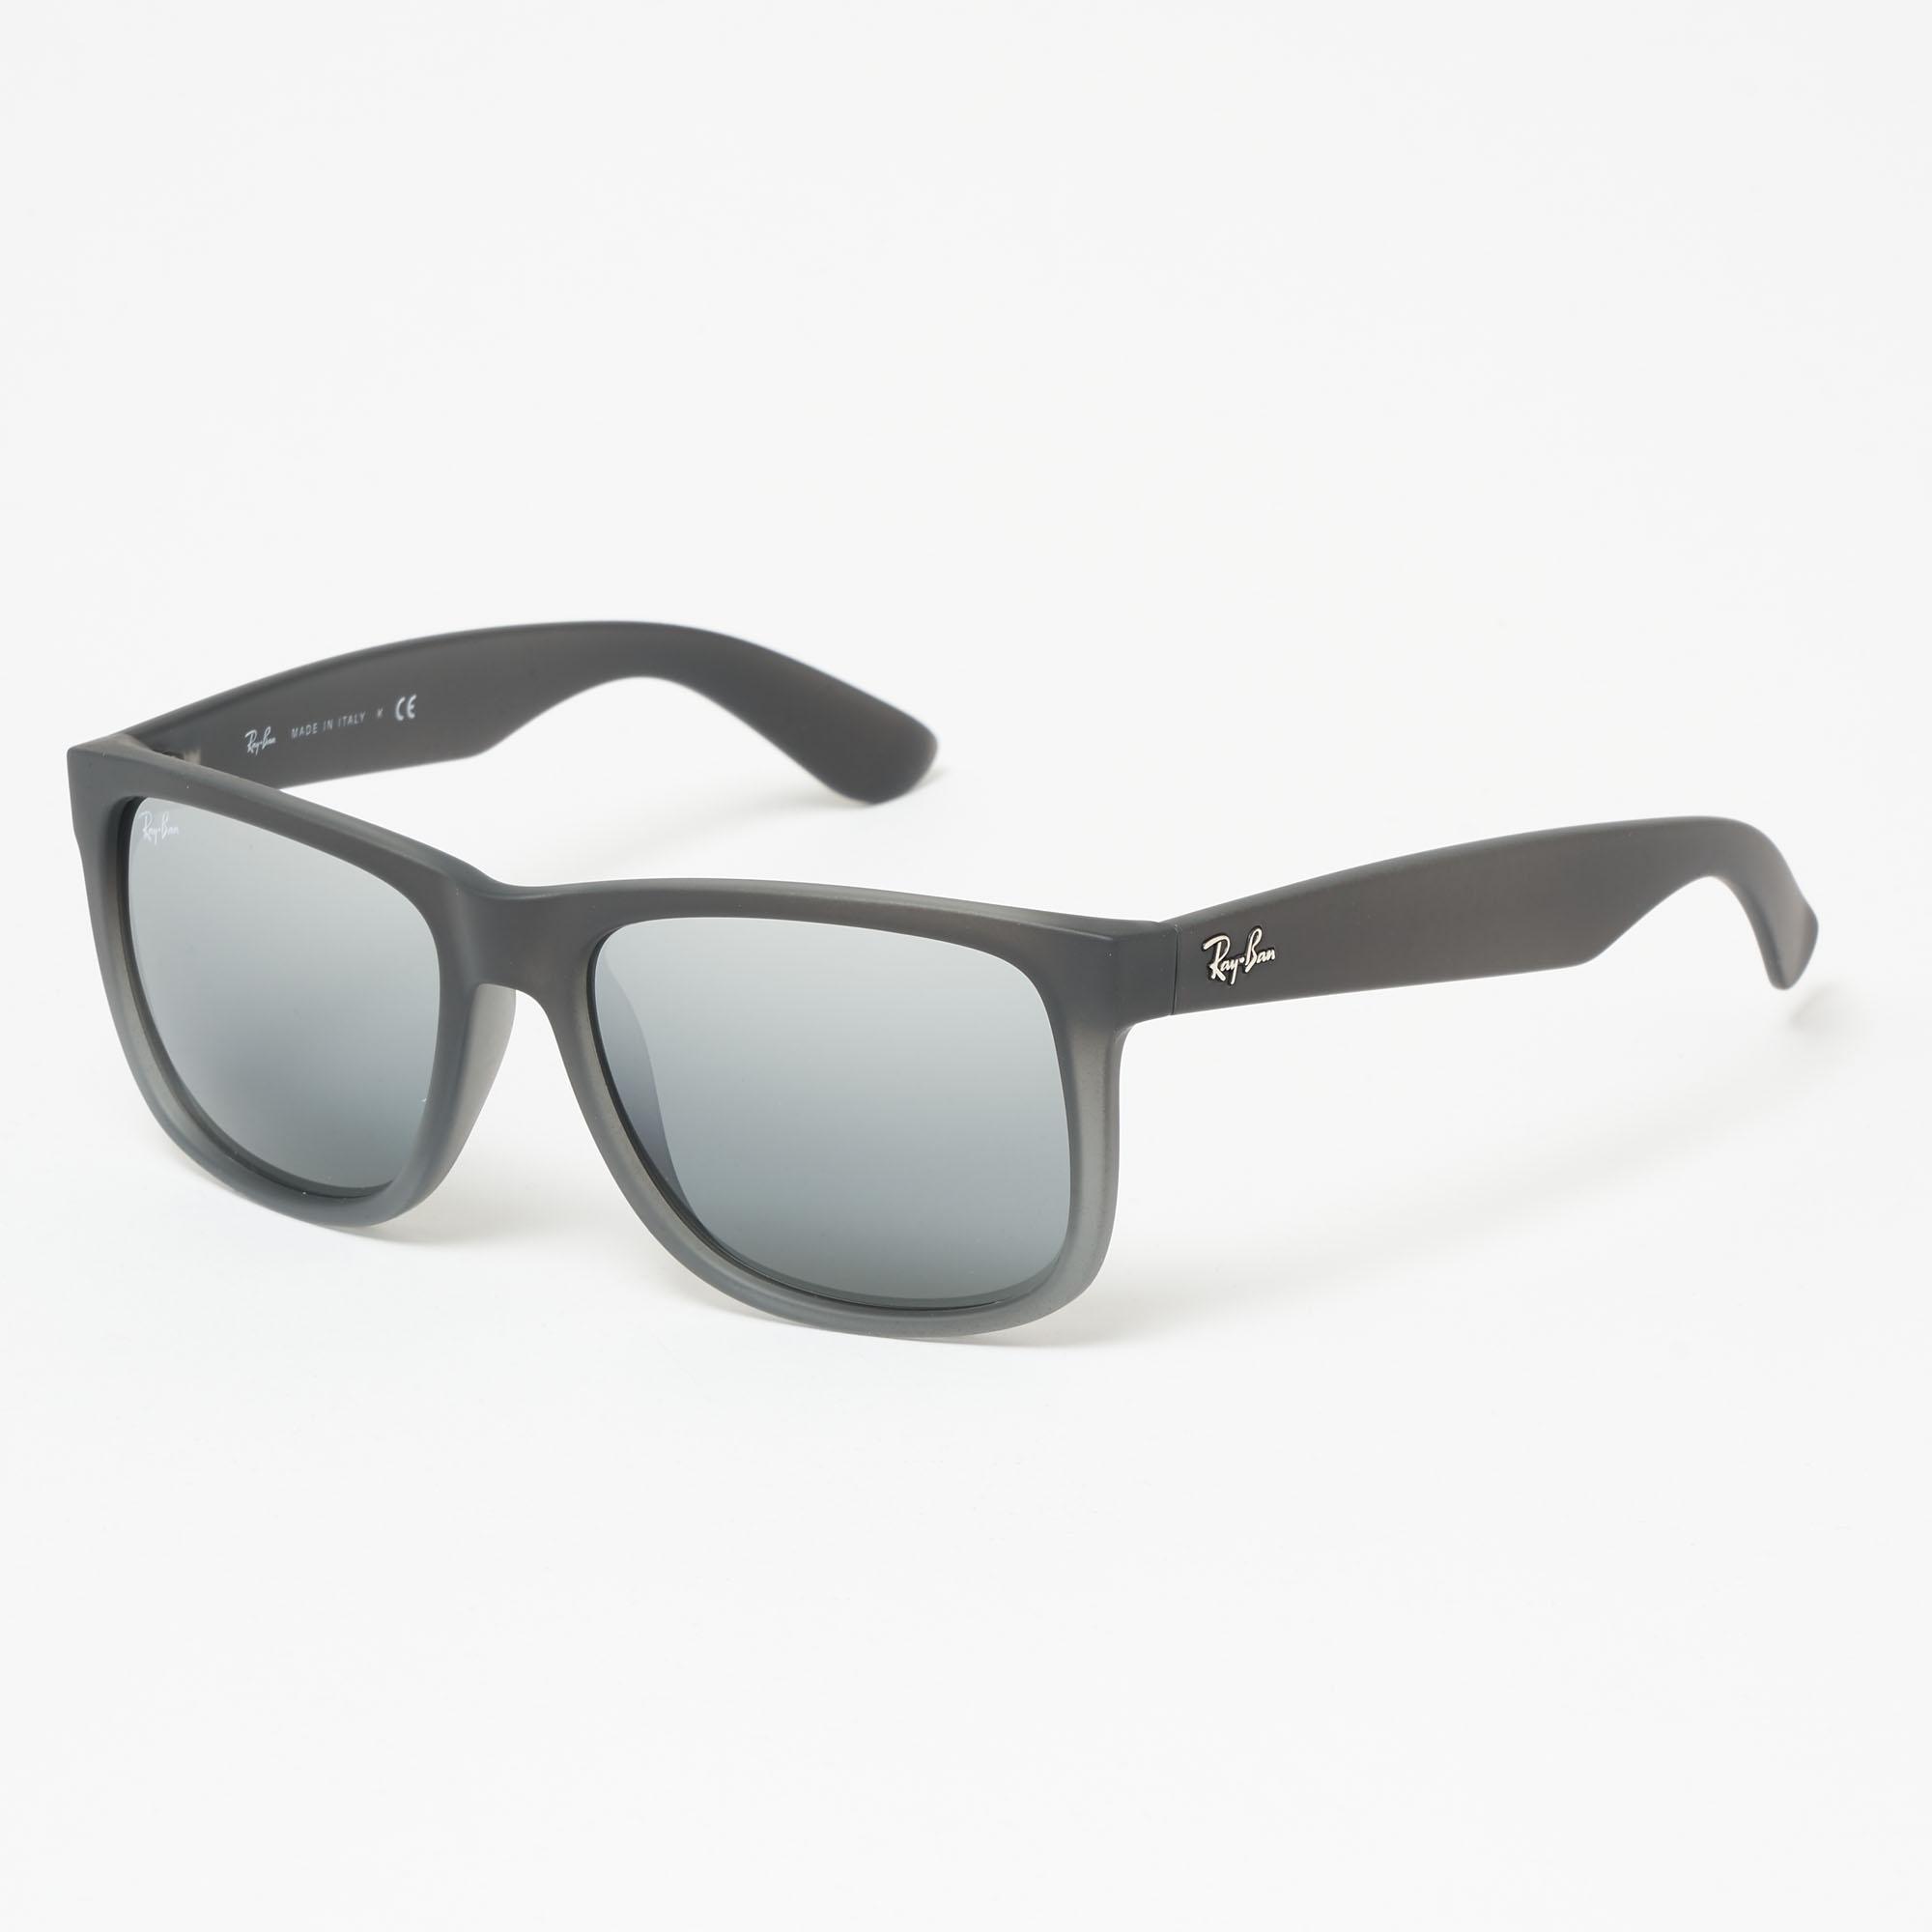 9c3906aa8d Ray-Ban. Men s Gray Smoke Grey Justin Sunglasses - Silver Gradient Mirror  Lenses